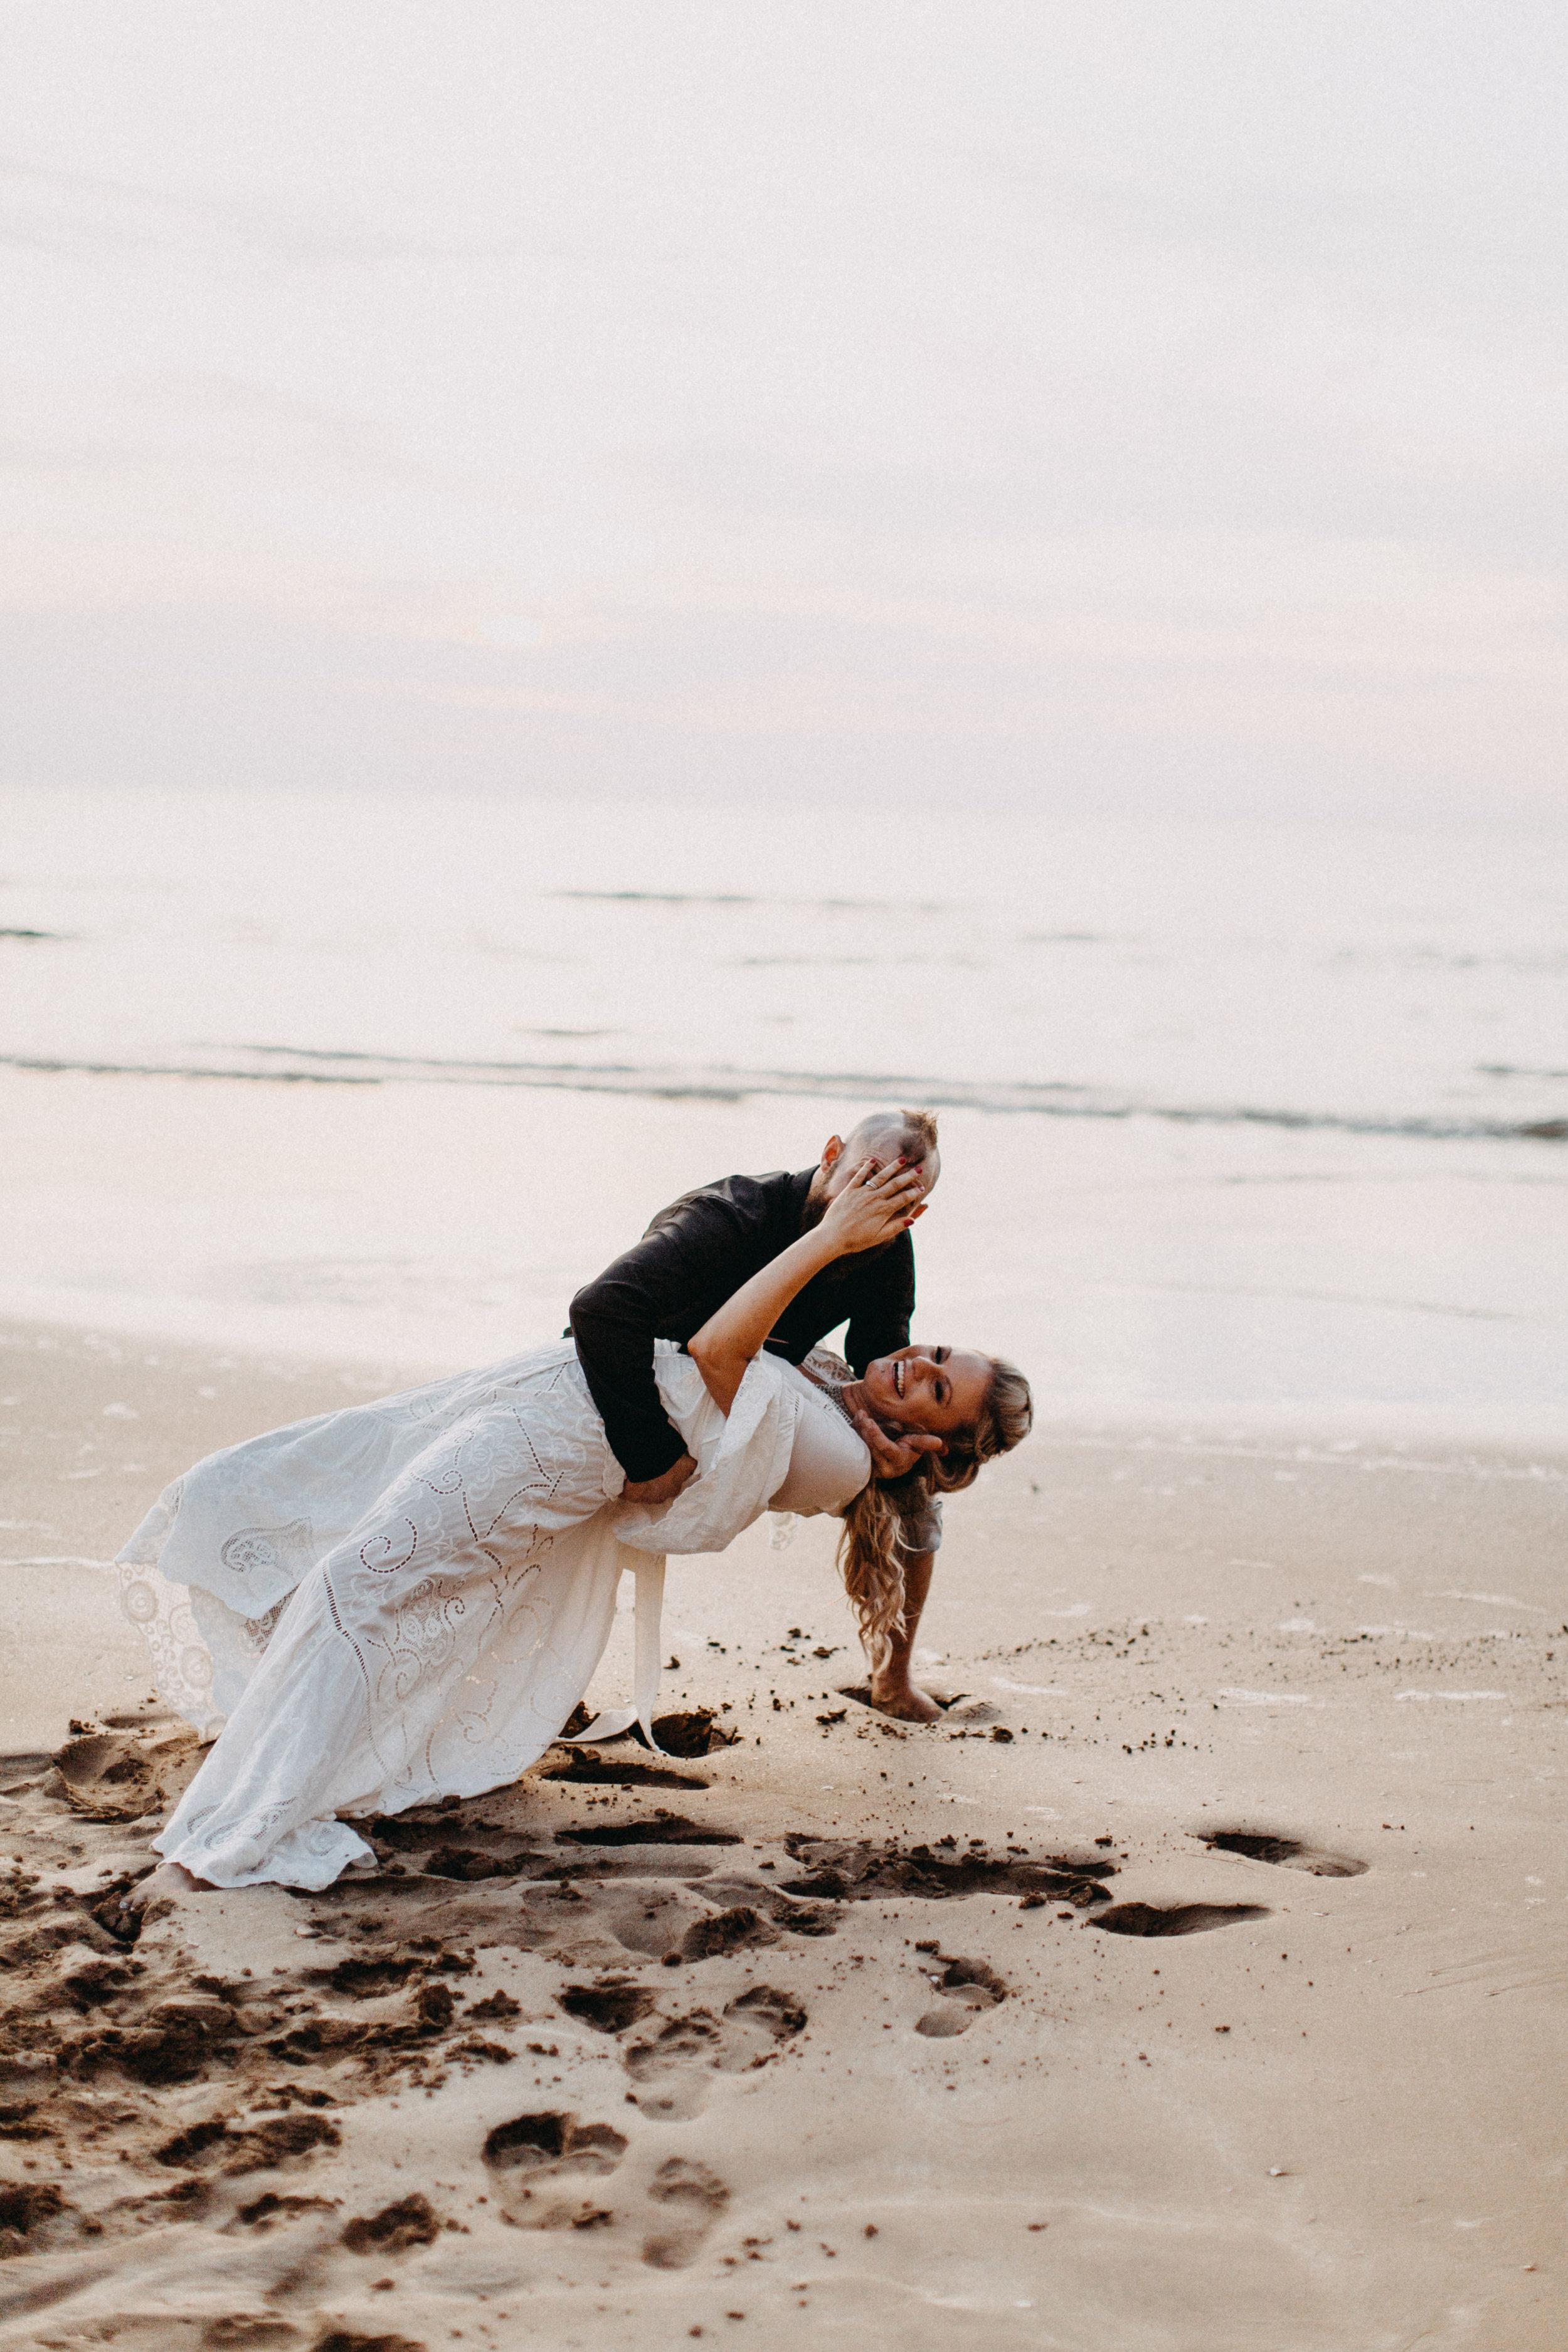 darwin-elopement-wedding-beach-camden-photography-www.emilyobrienphotography.net-92.jpg